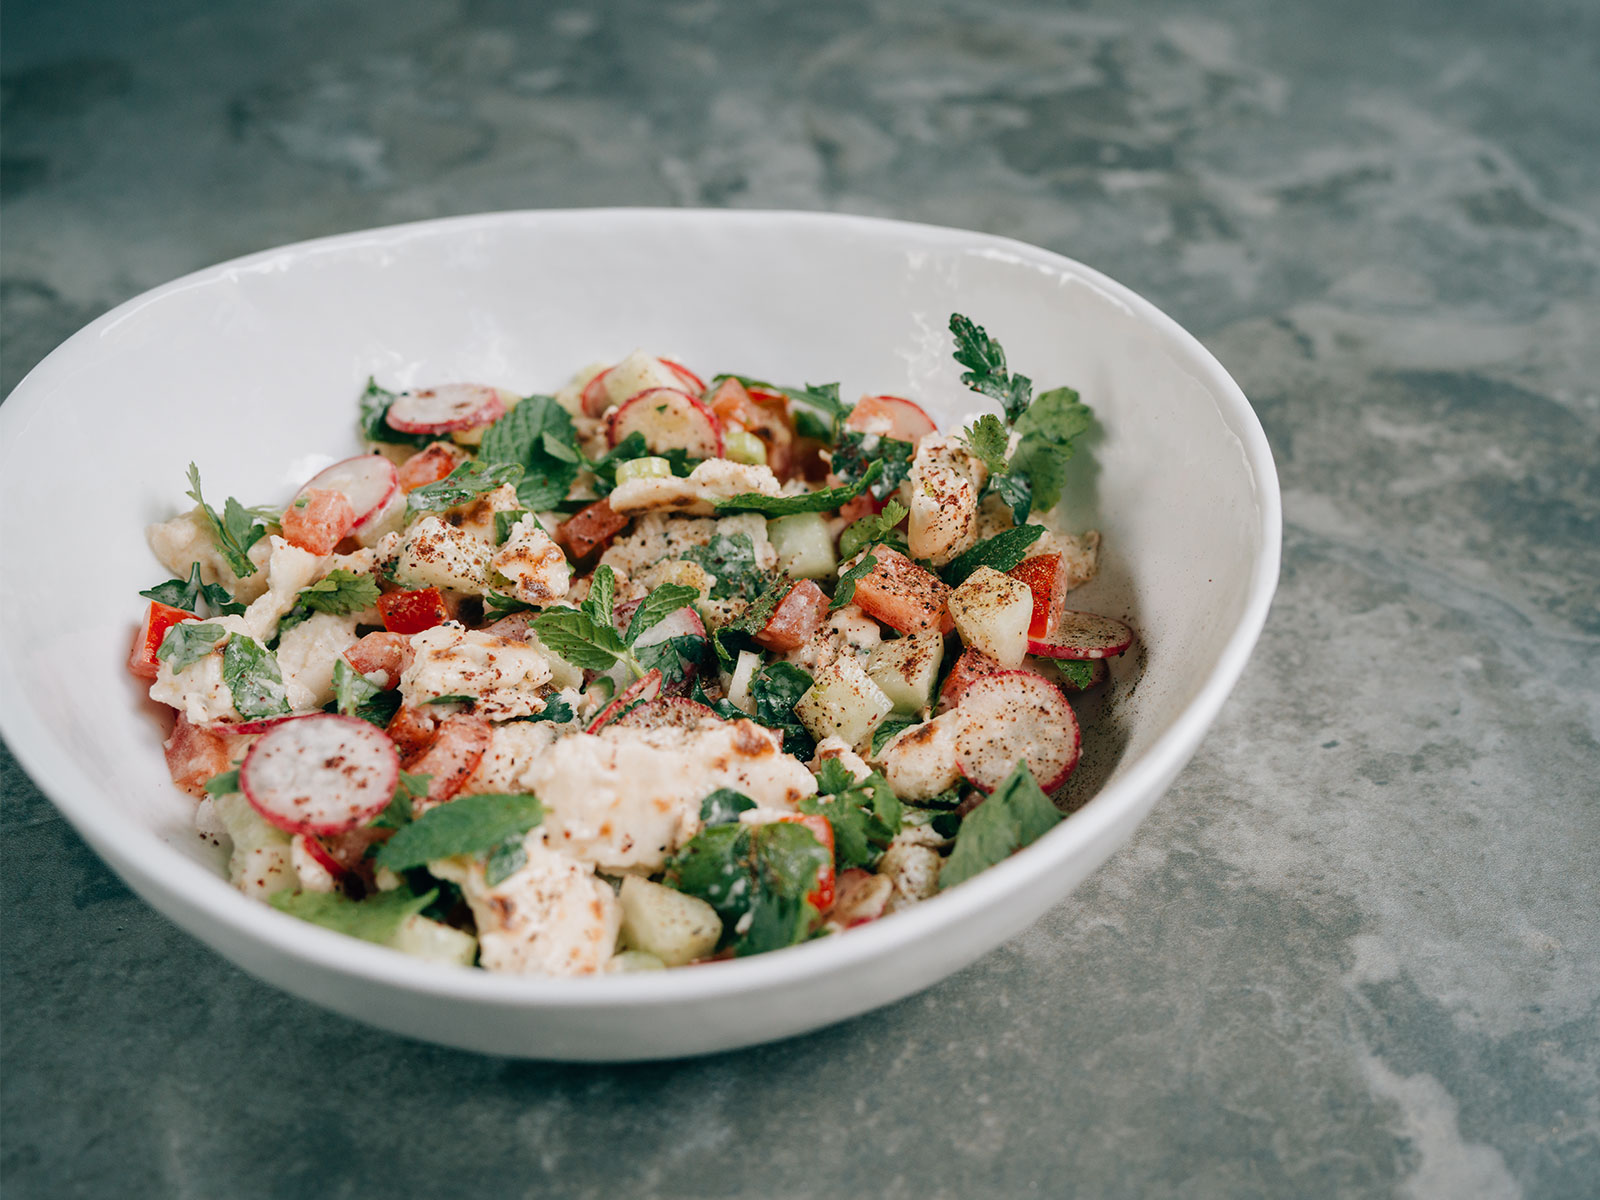 Na'ama's Fattoush Salad | recipe by Yotam Ottolenghi & Sami Tamimi